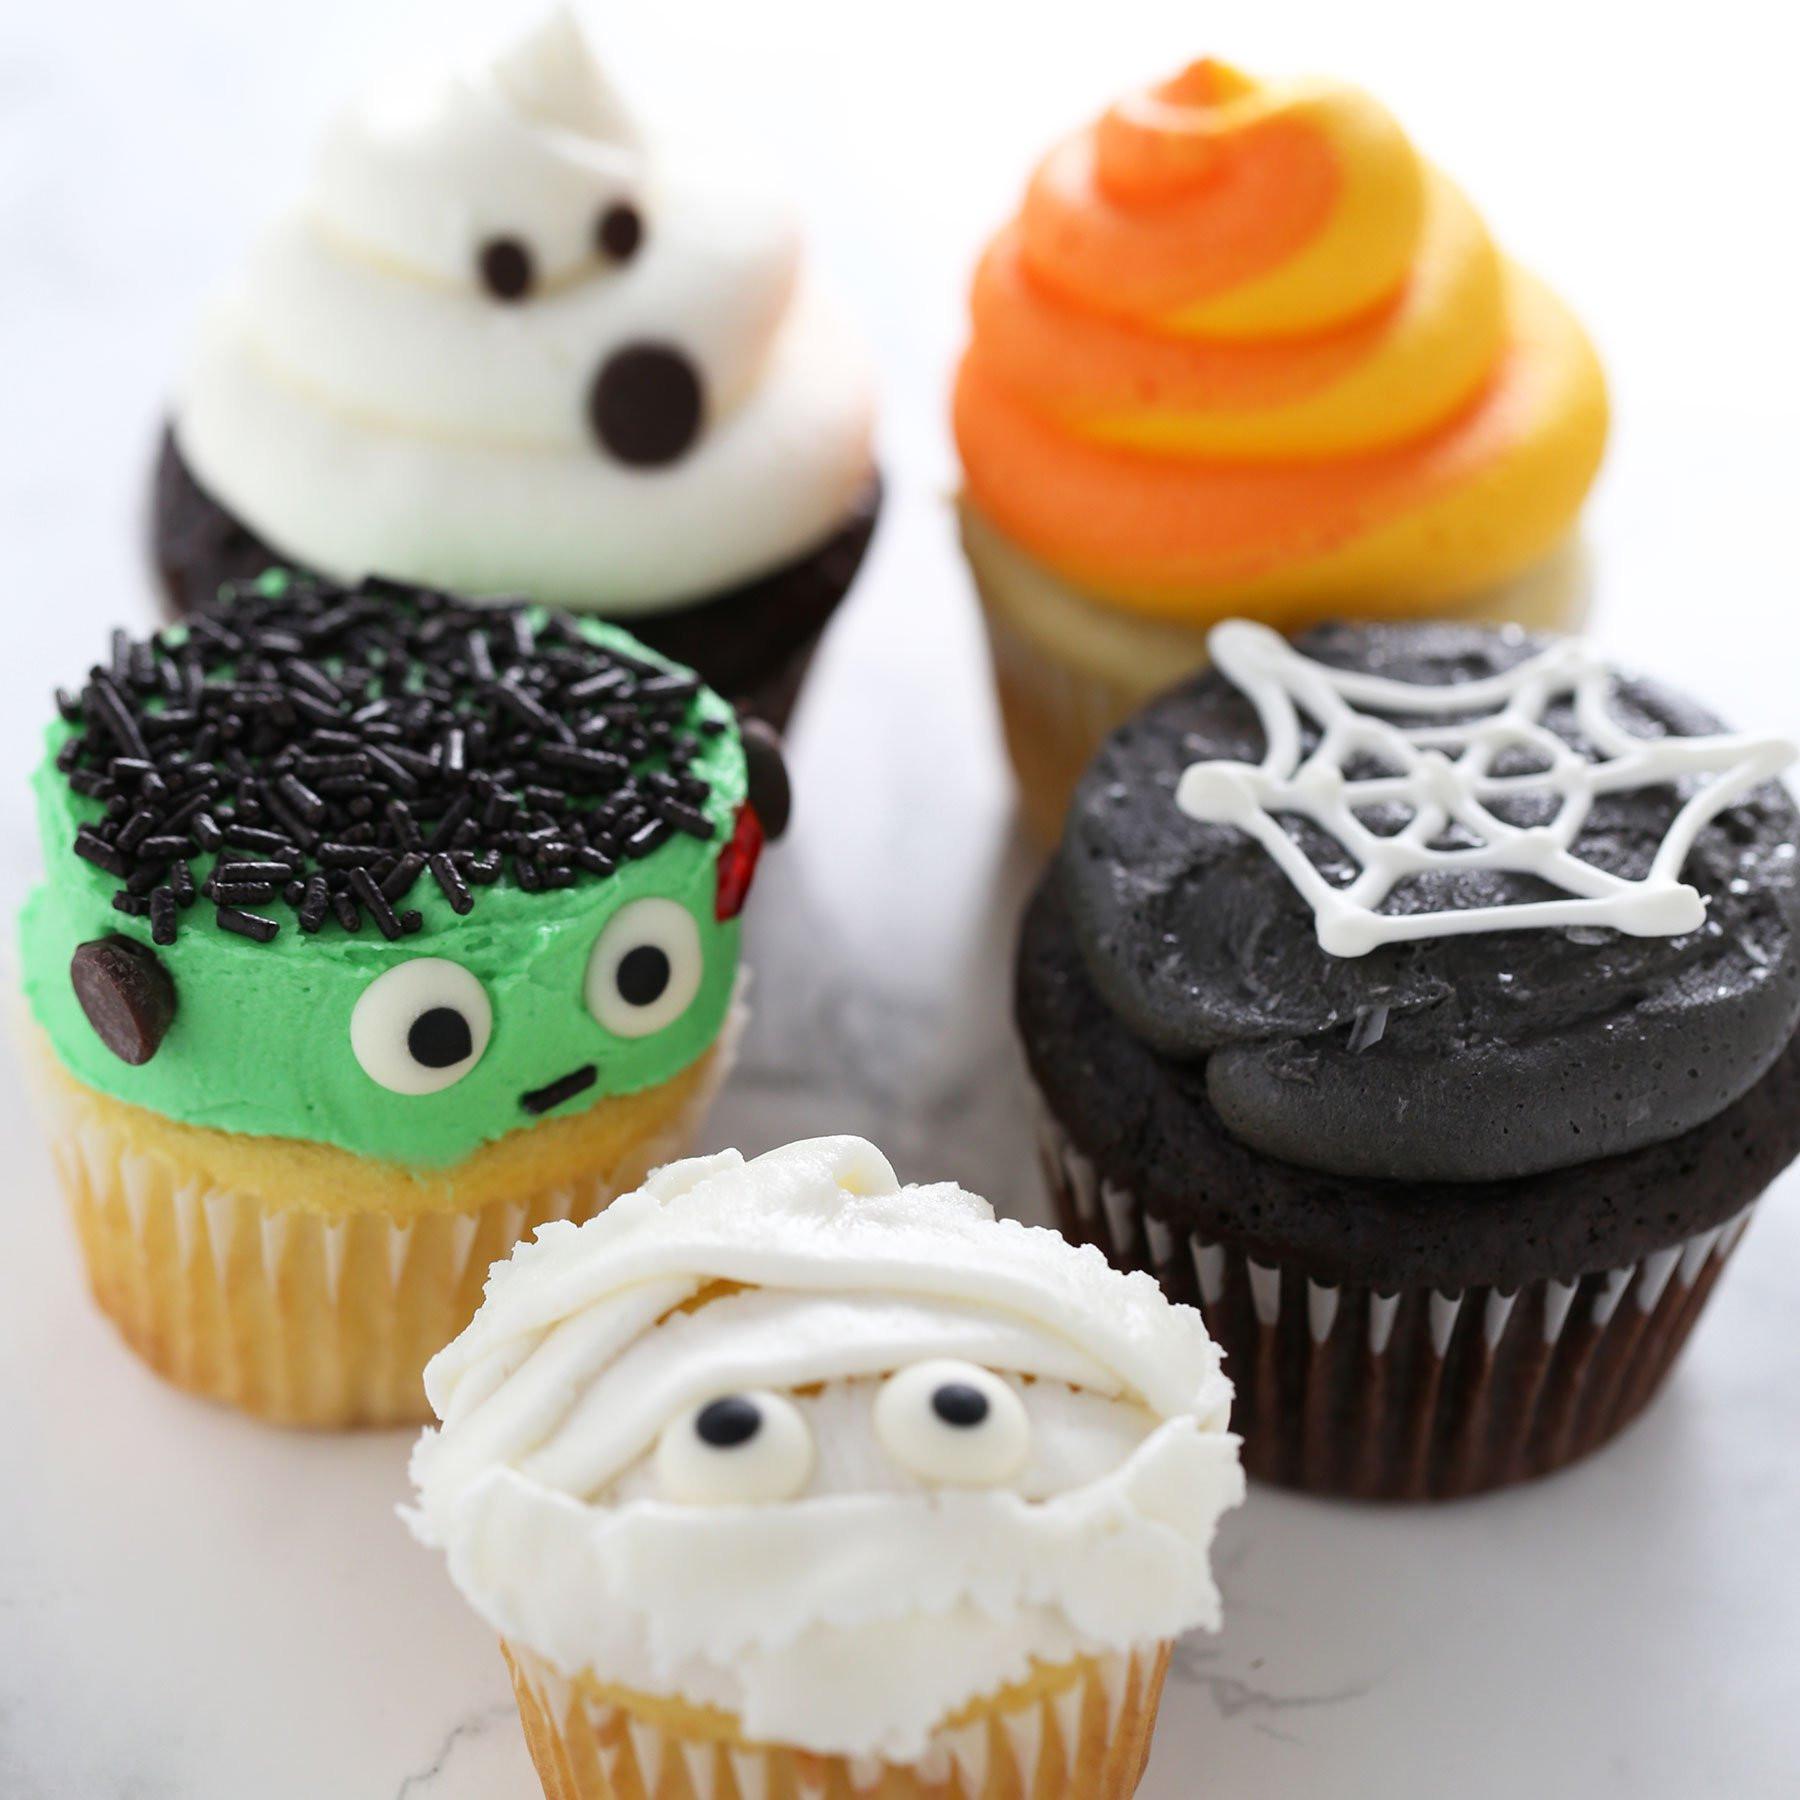 Halloween Cupcakes Cakes  How to Make Halloween Cupcakes Handle the Heat